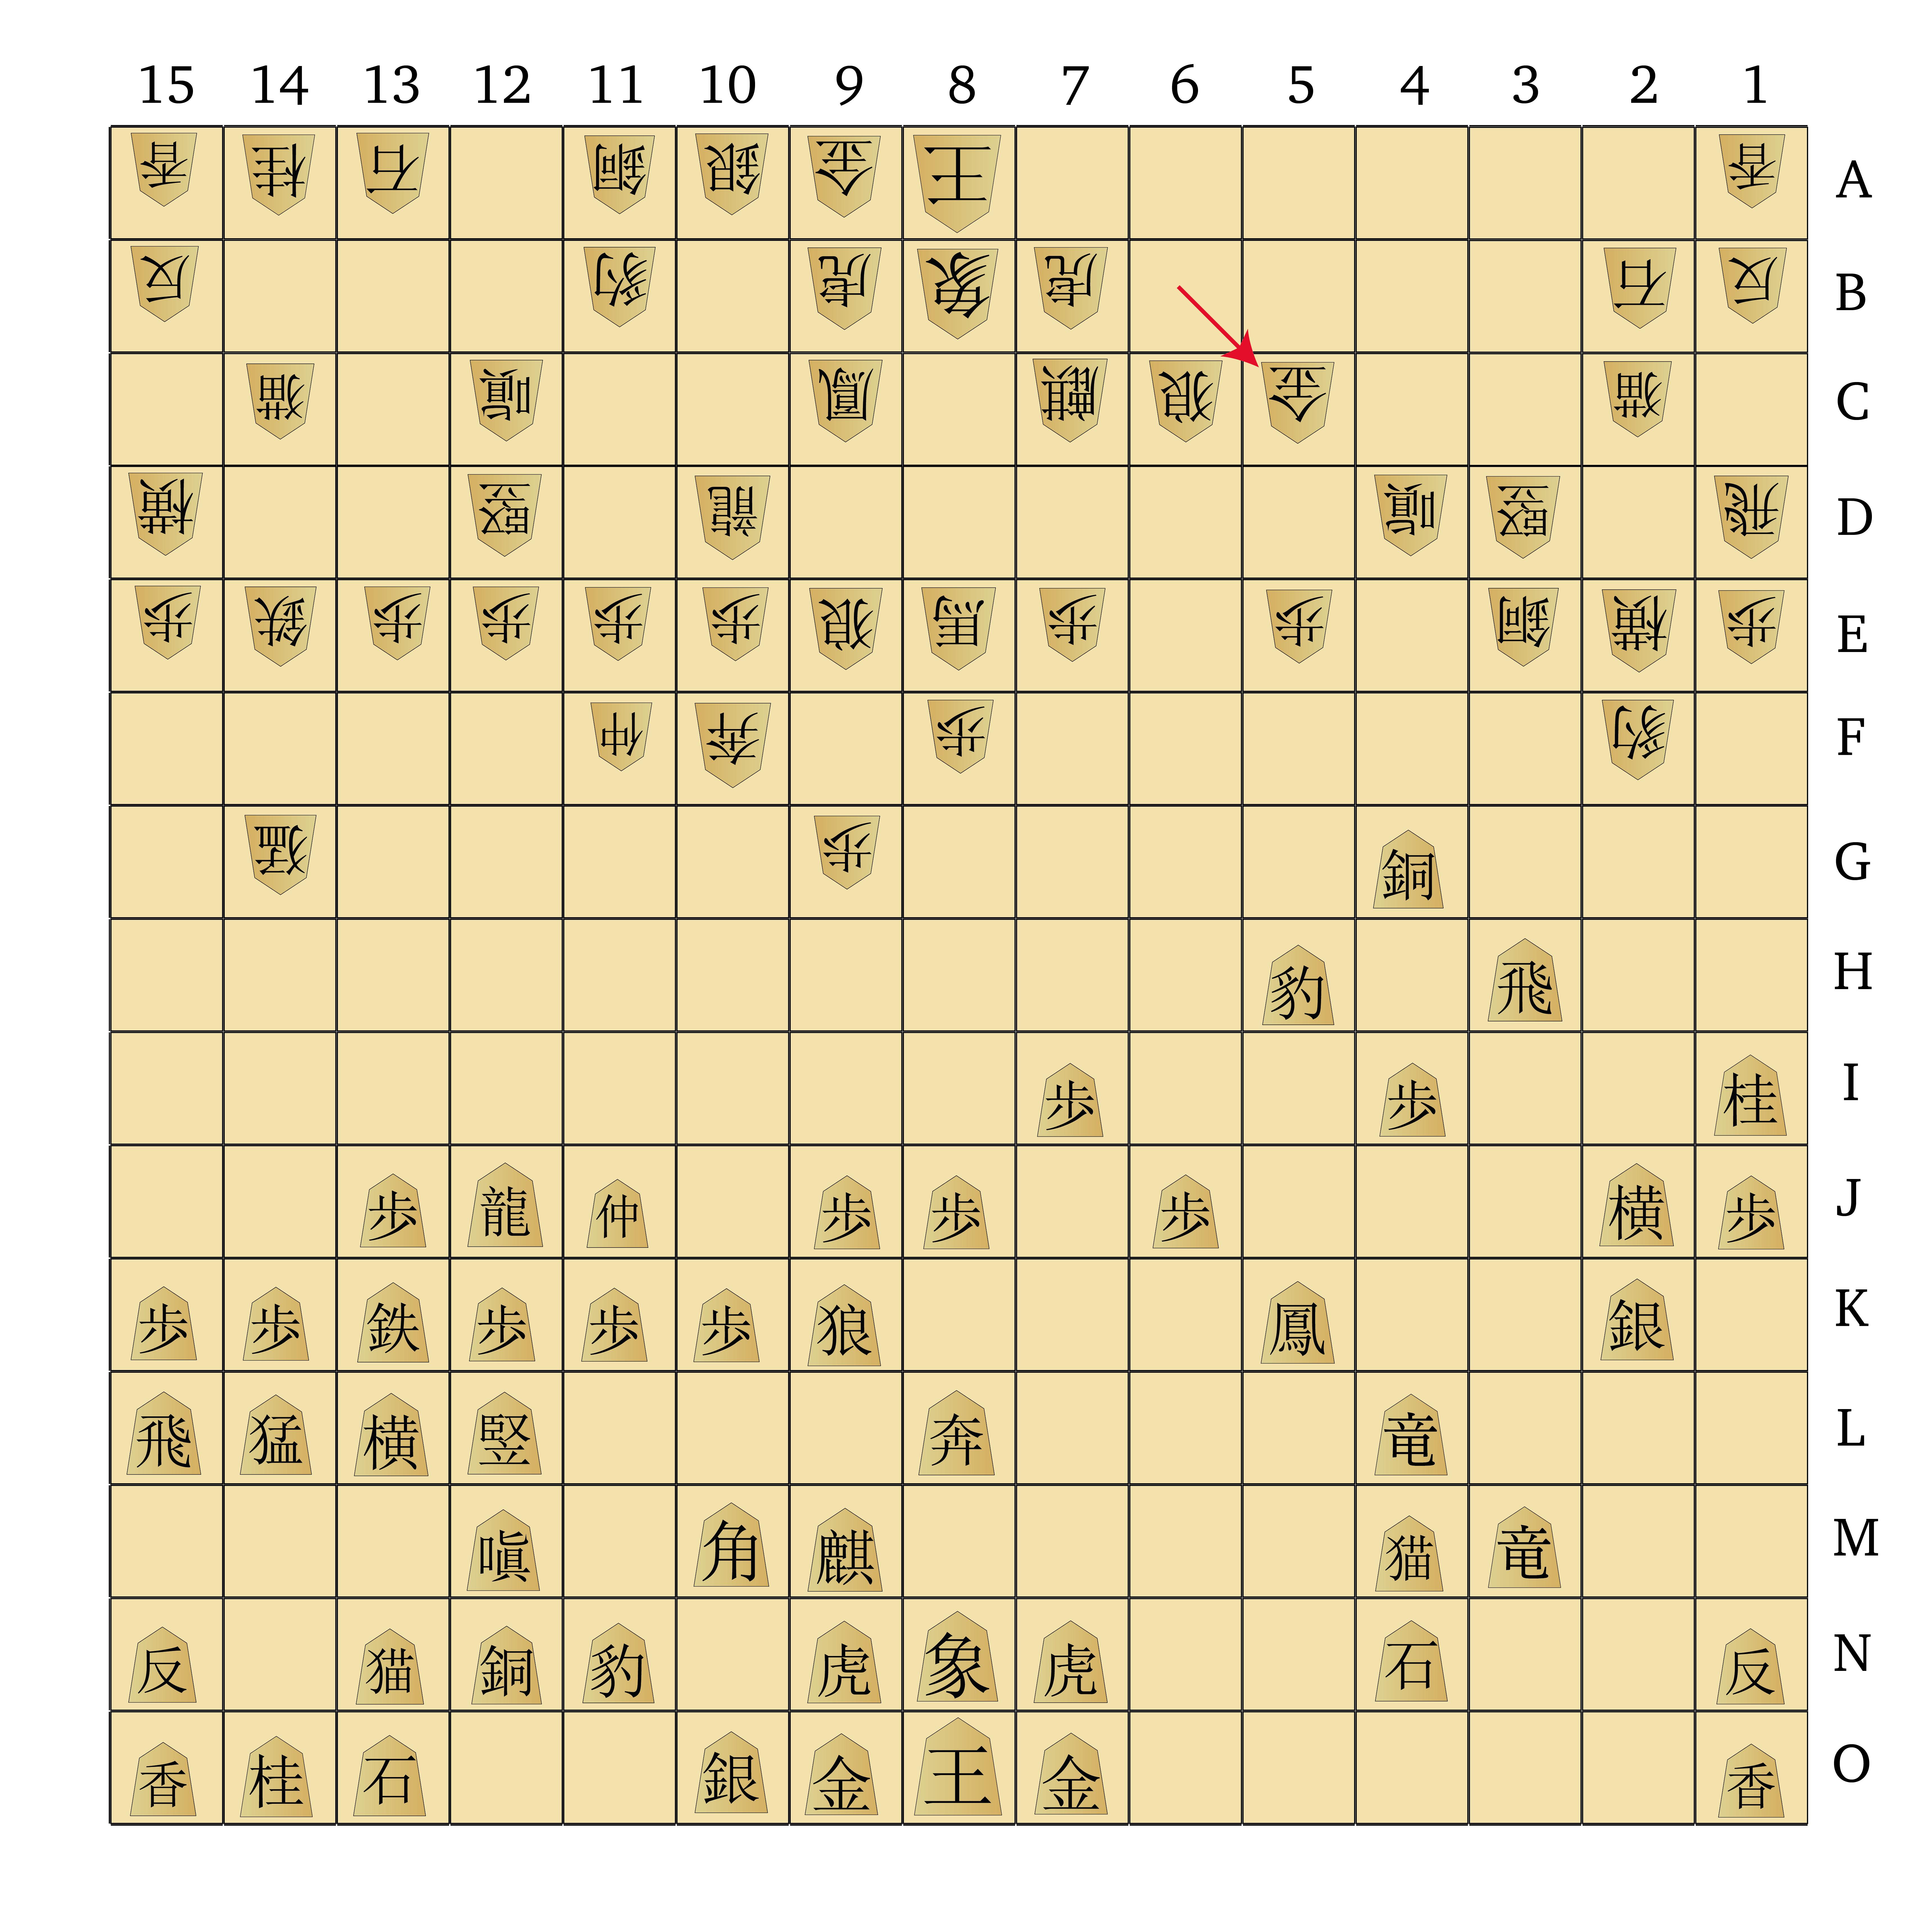 Dai Shogi 420 -- Move 200-01